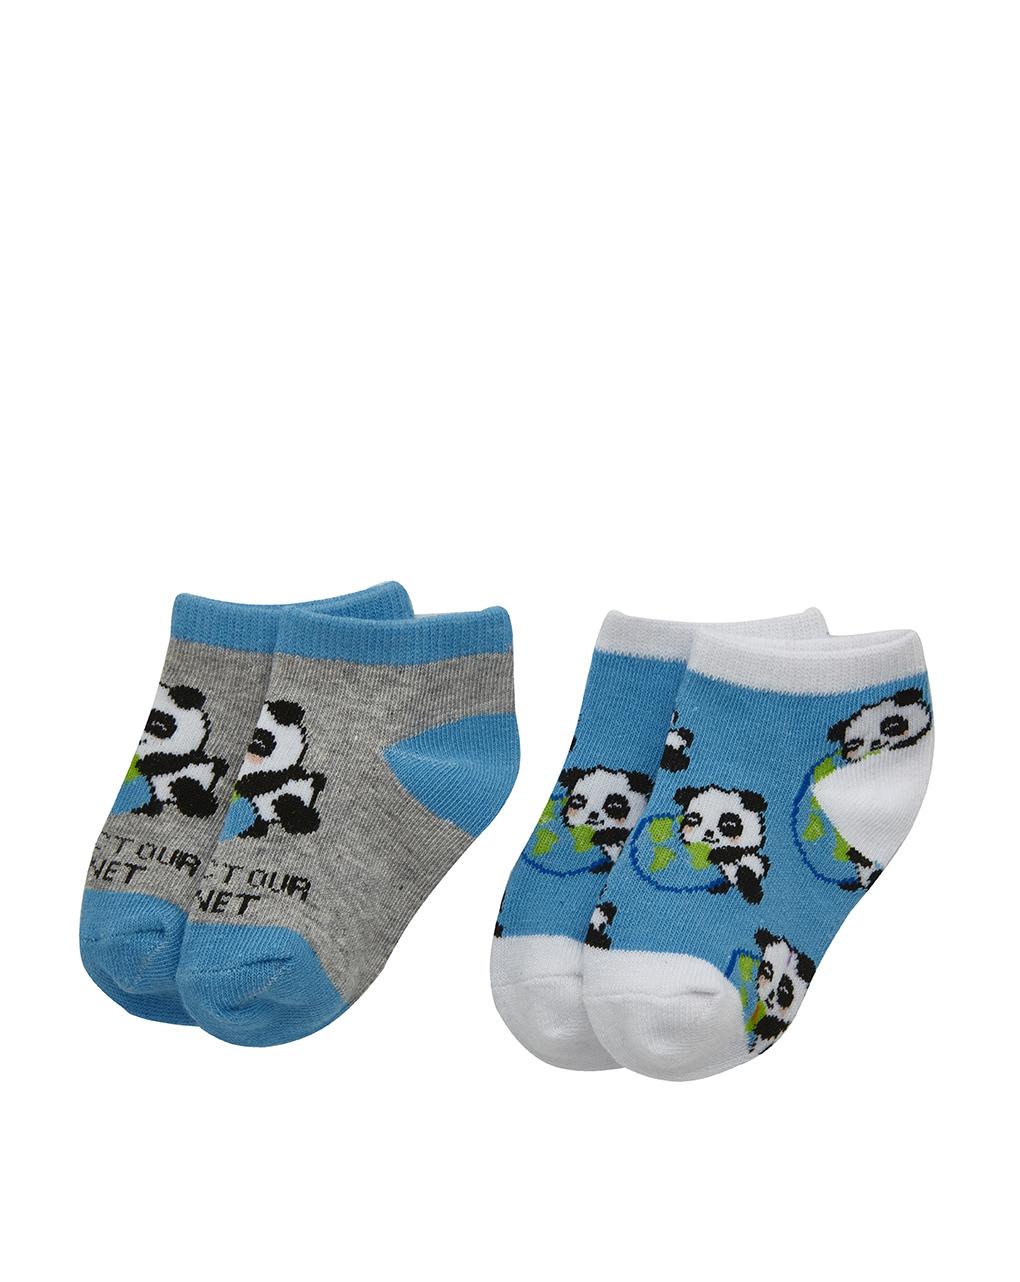 Pack 2 paia calzini con stampa panda - Prénatal